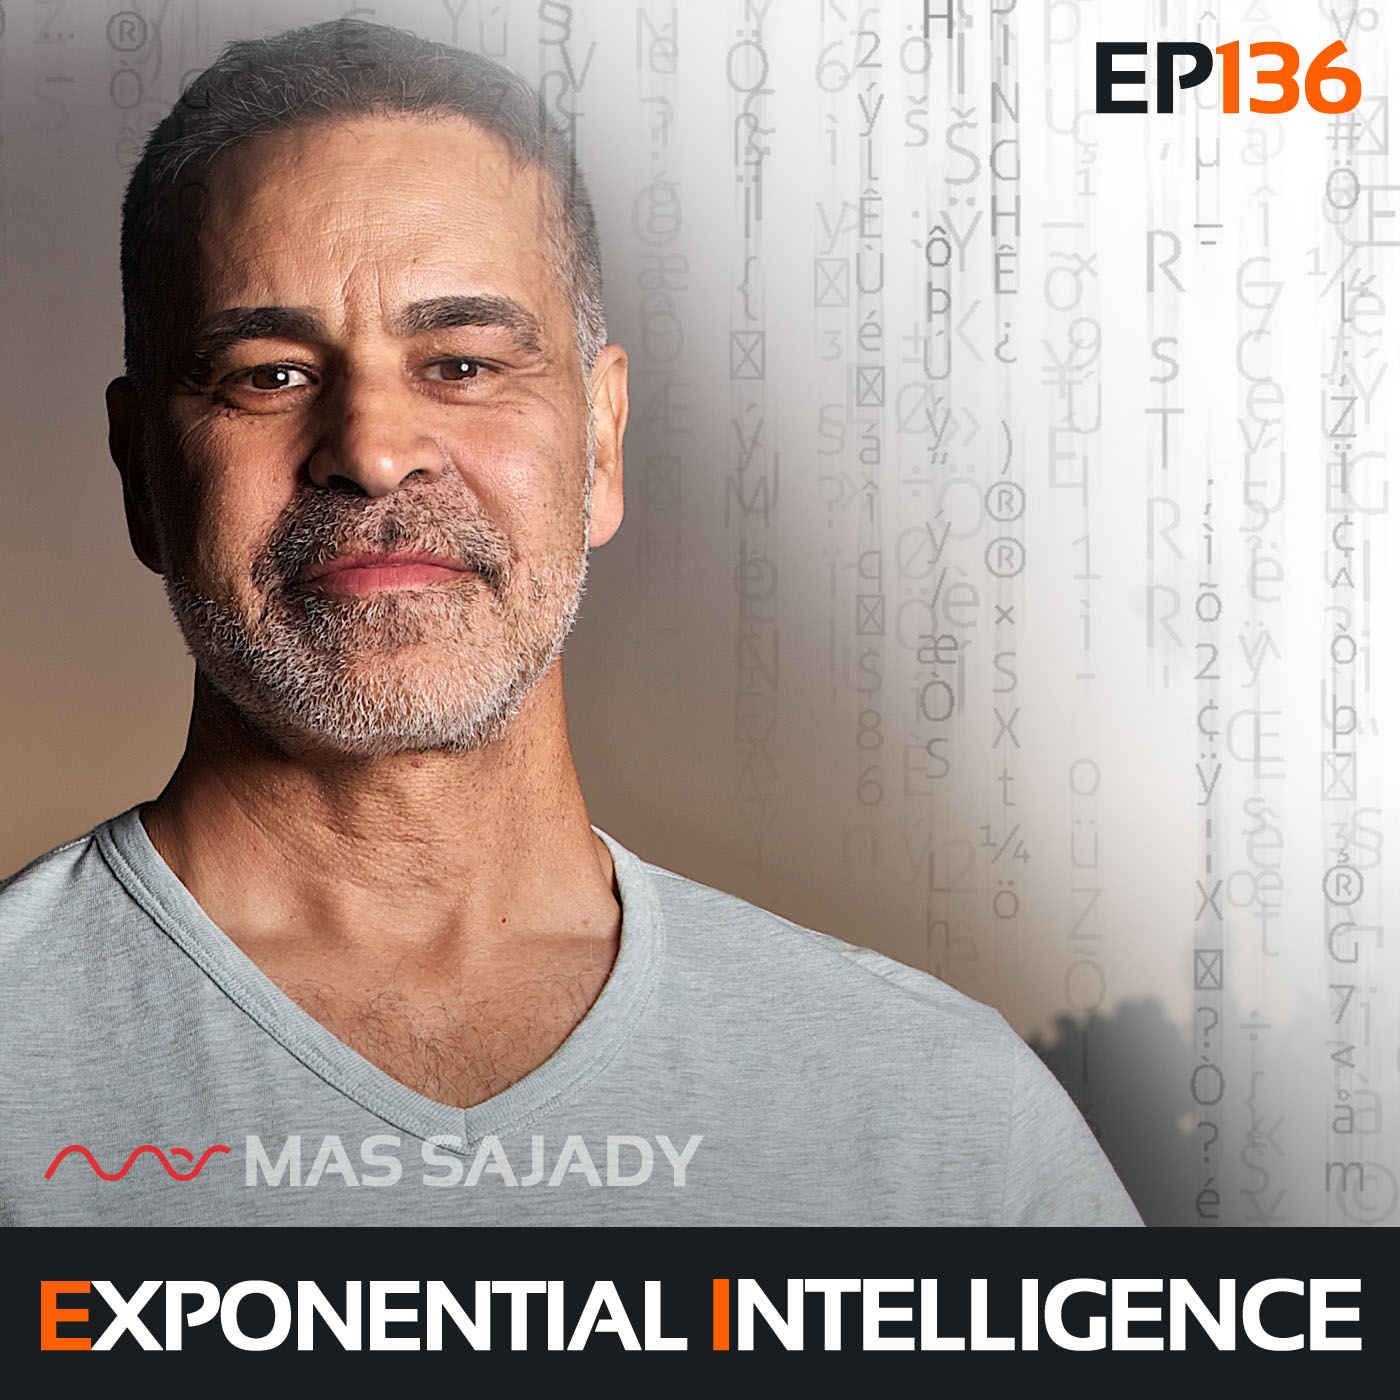 136 episode art - exponential intelligence.jpg